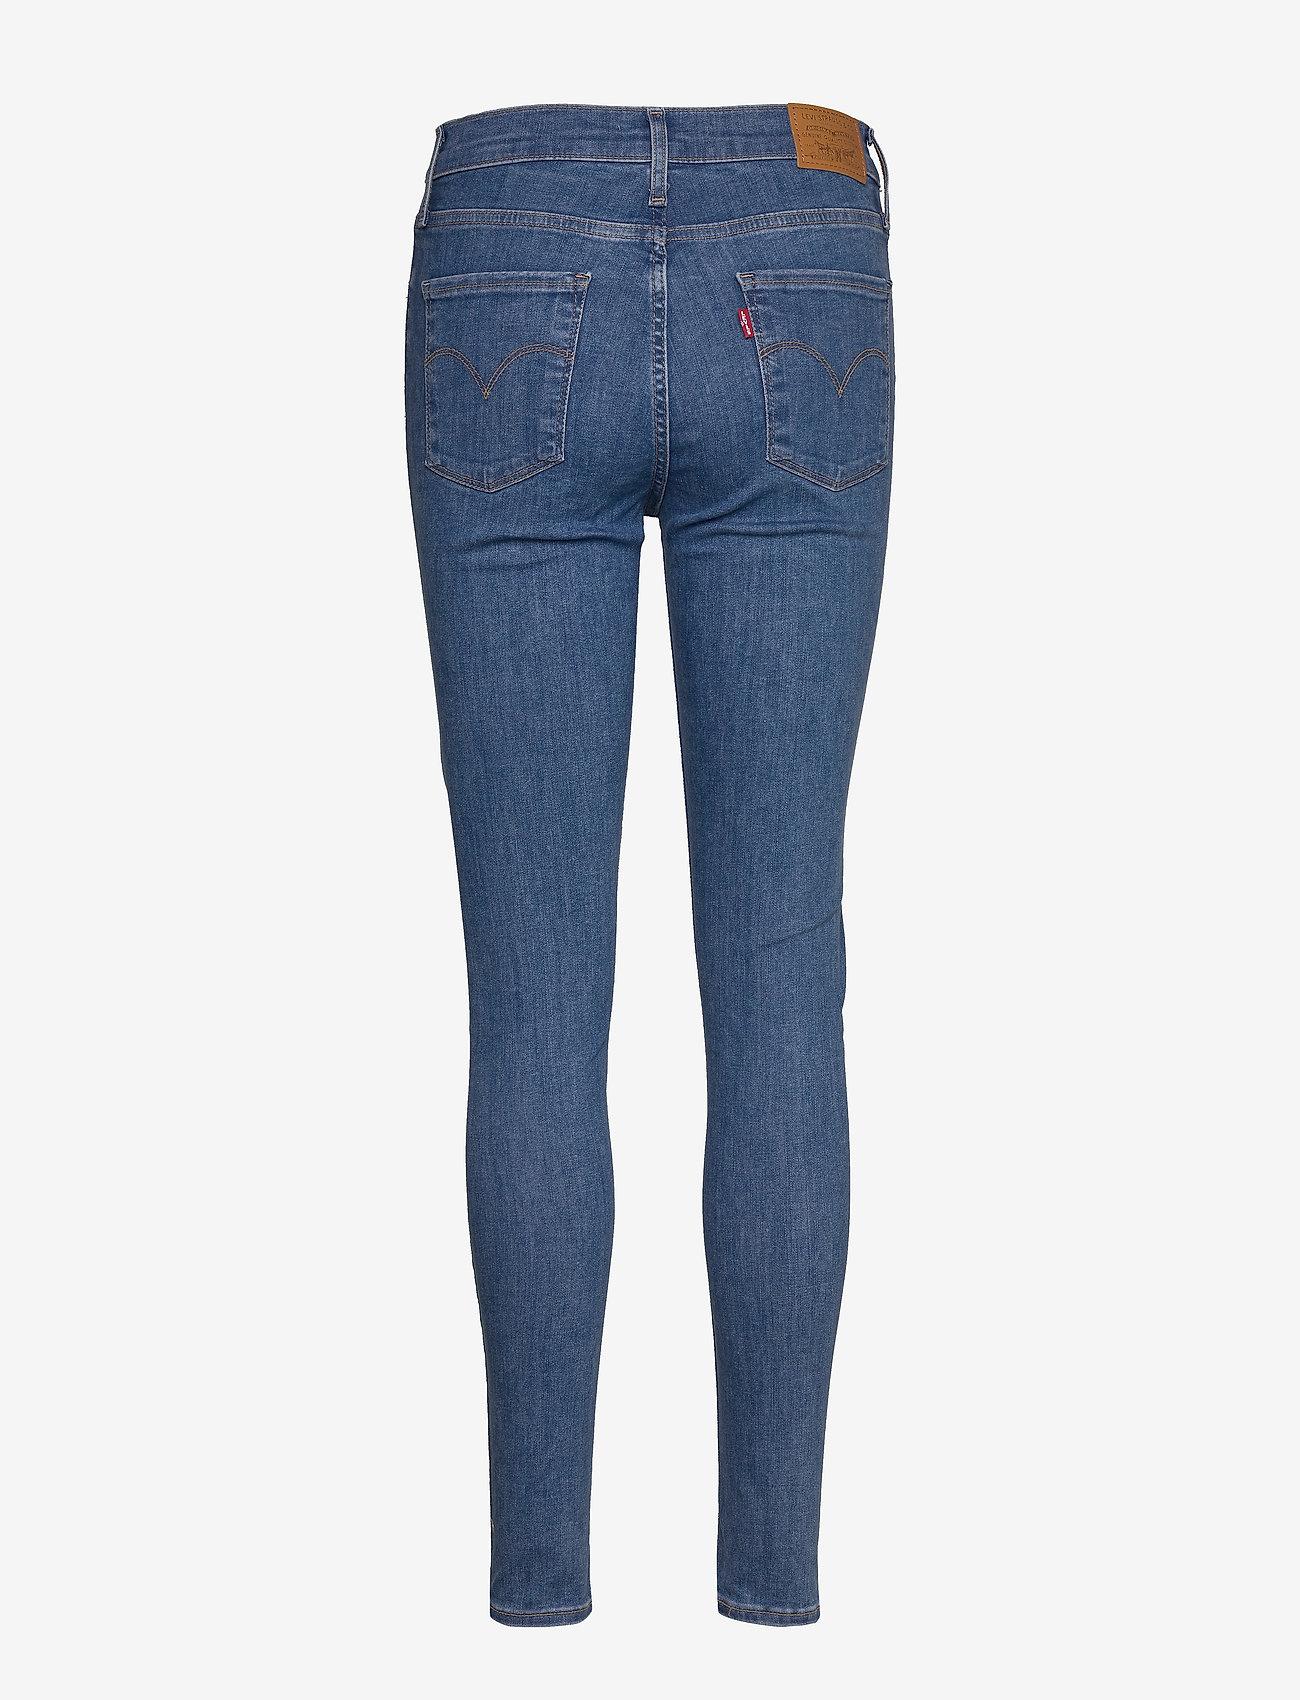 LEVI´S Women - 720 HIRISE SUPER SKINNY ECLIPS - skinny jeans - med indigo - flat finish - 1